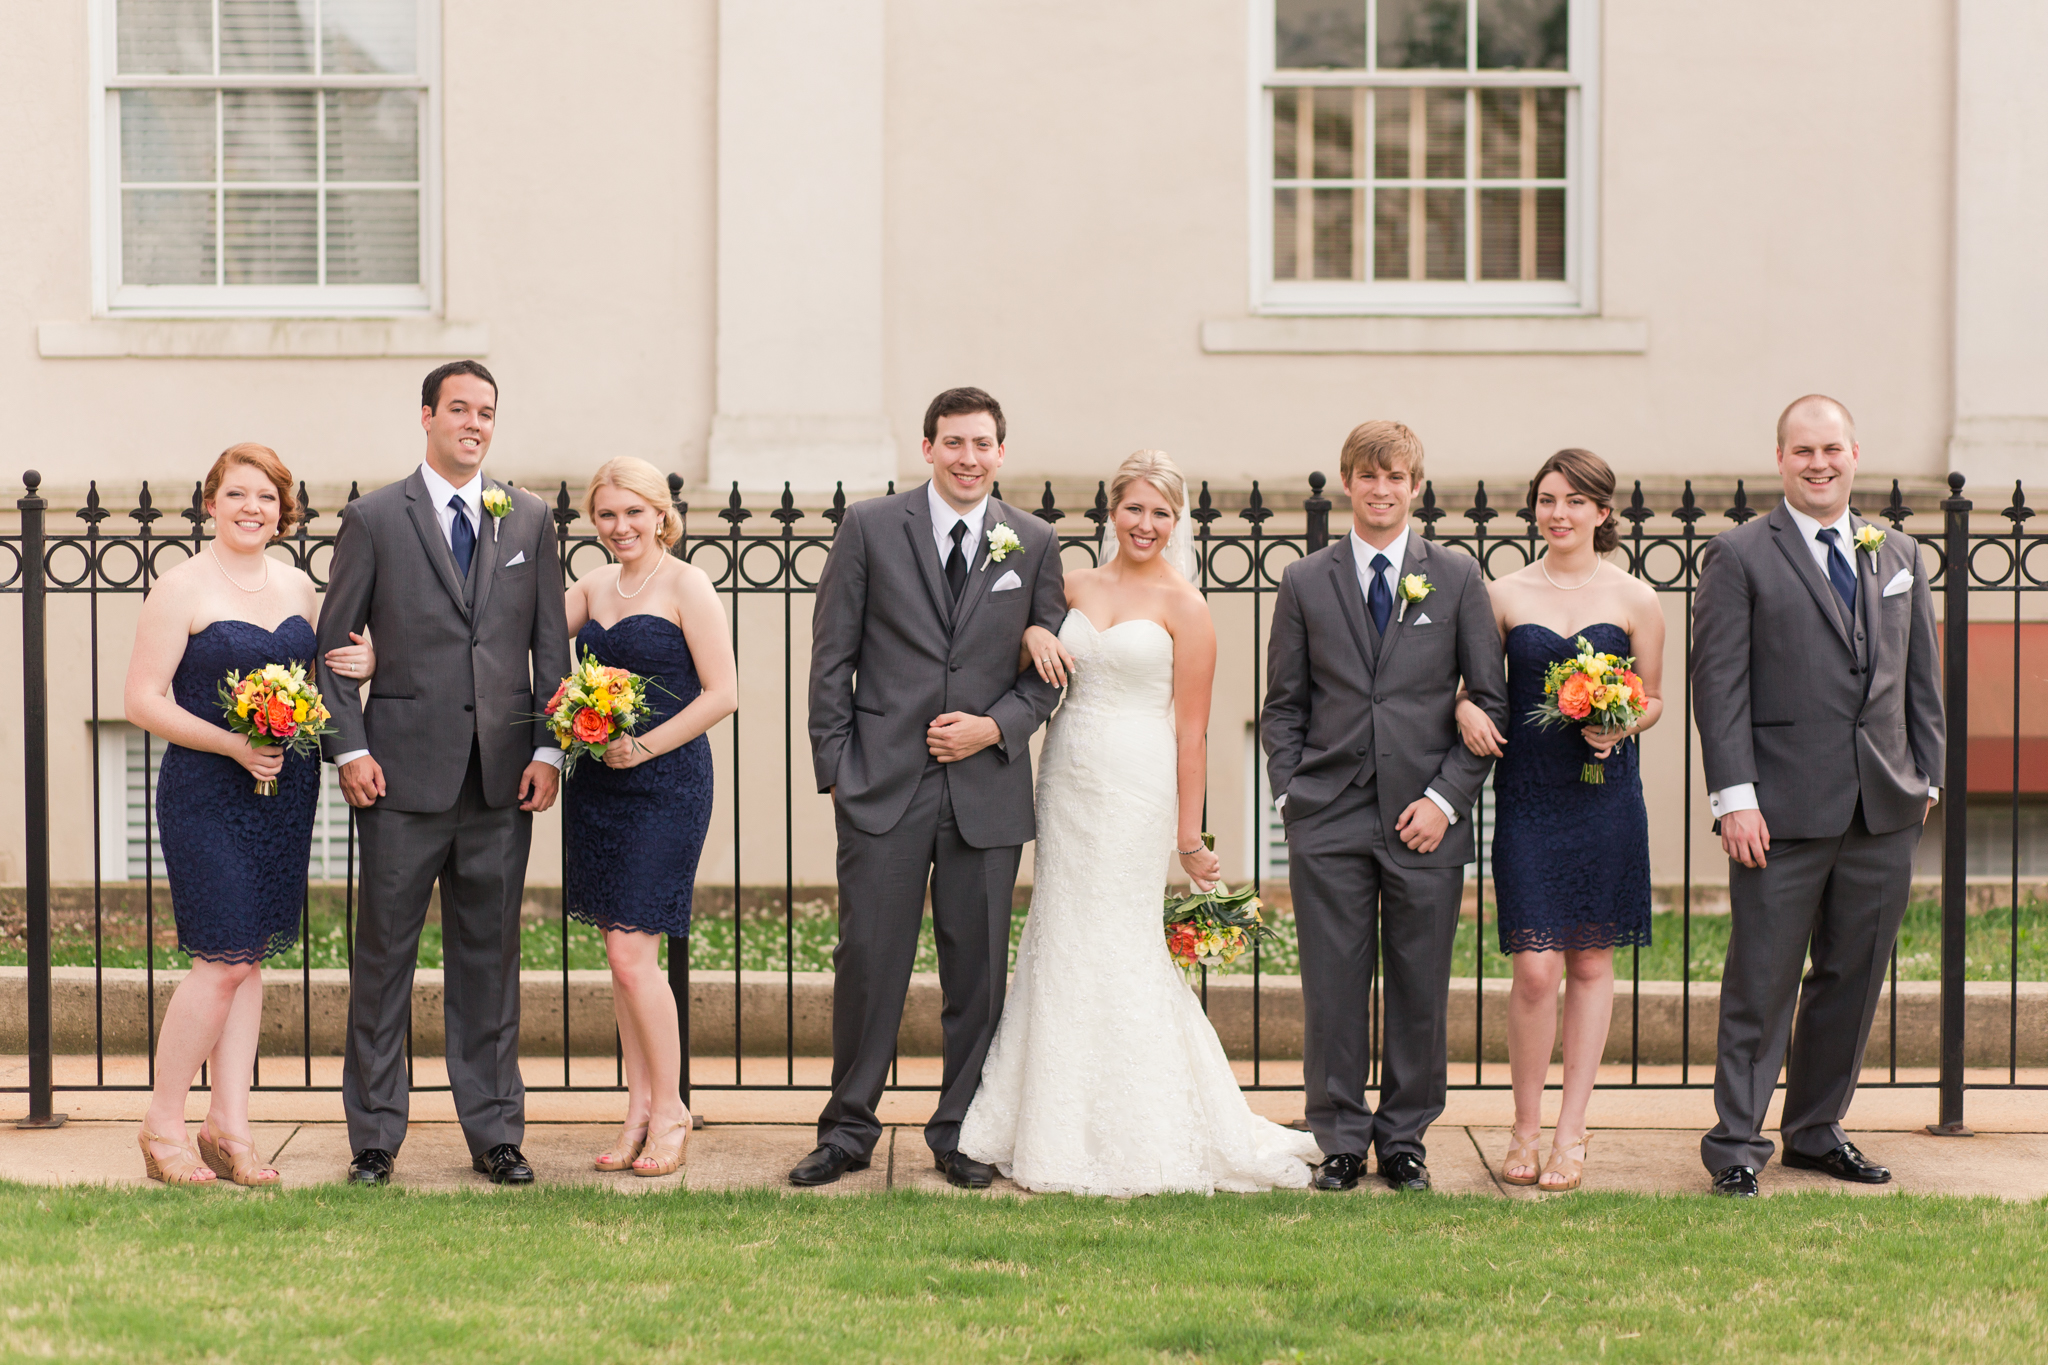 Ashley-Amber-Photo-Outdoor-Wedding-Photography-164059.jpg